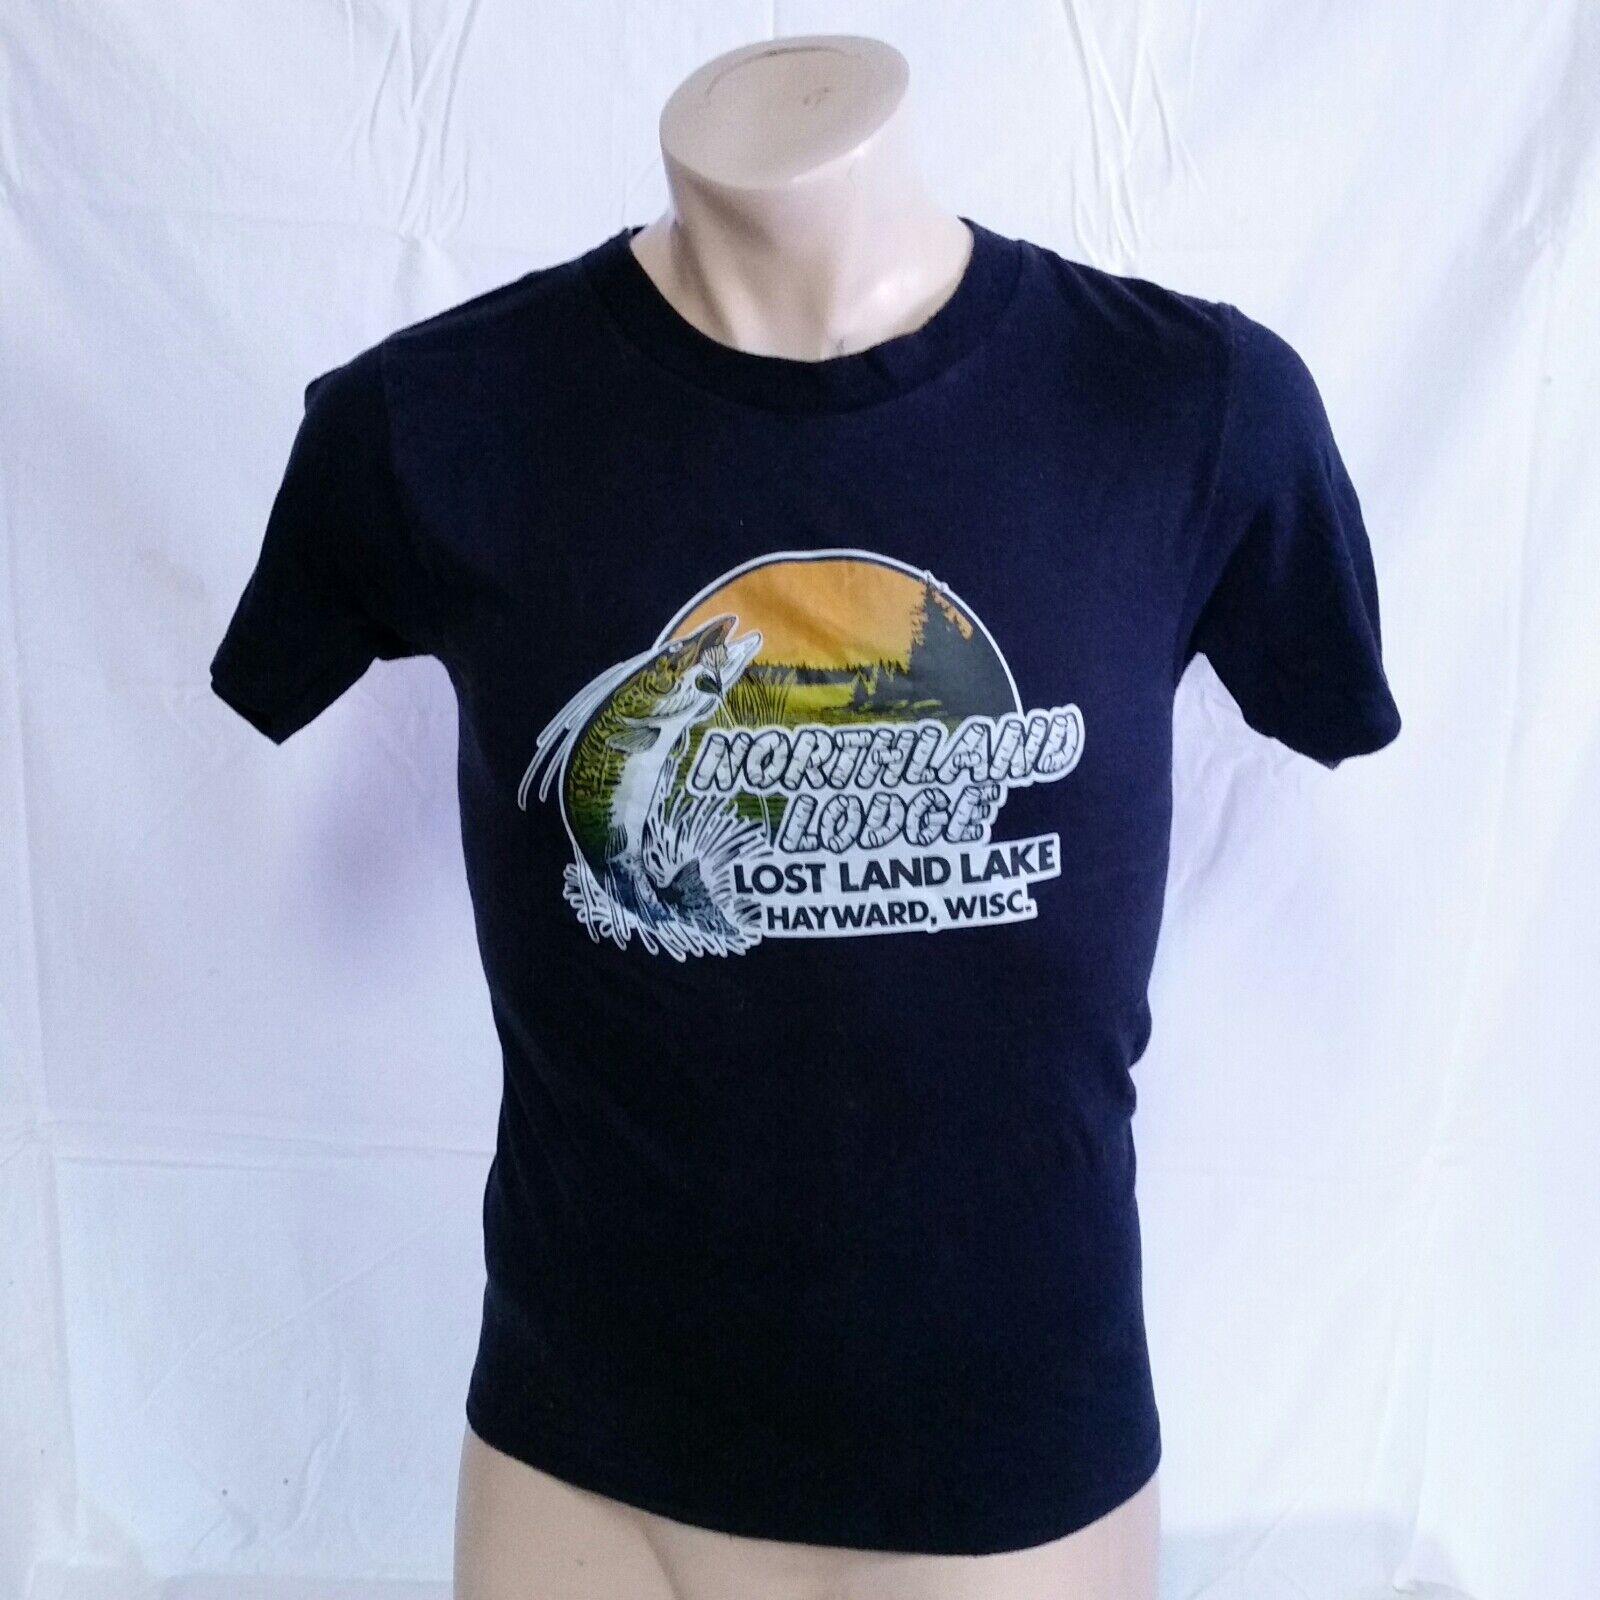 VTG 80s Wisconsin T Shirt 50/50 Fishing Tourist Tee Vacation Band Farming Large